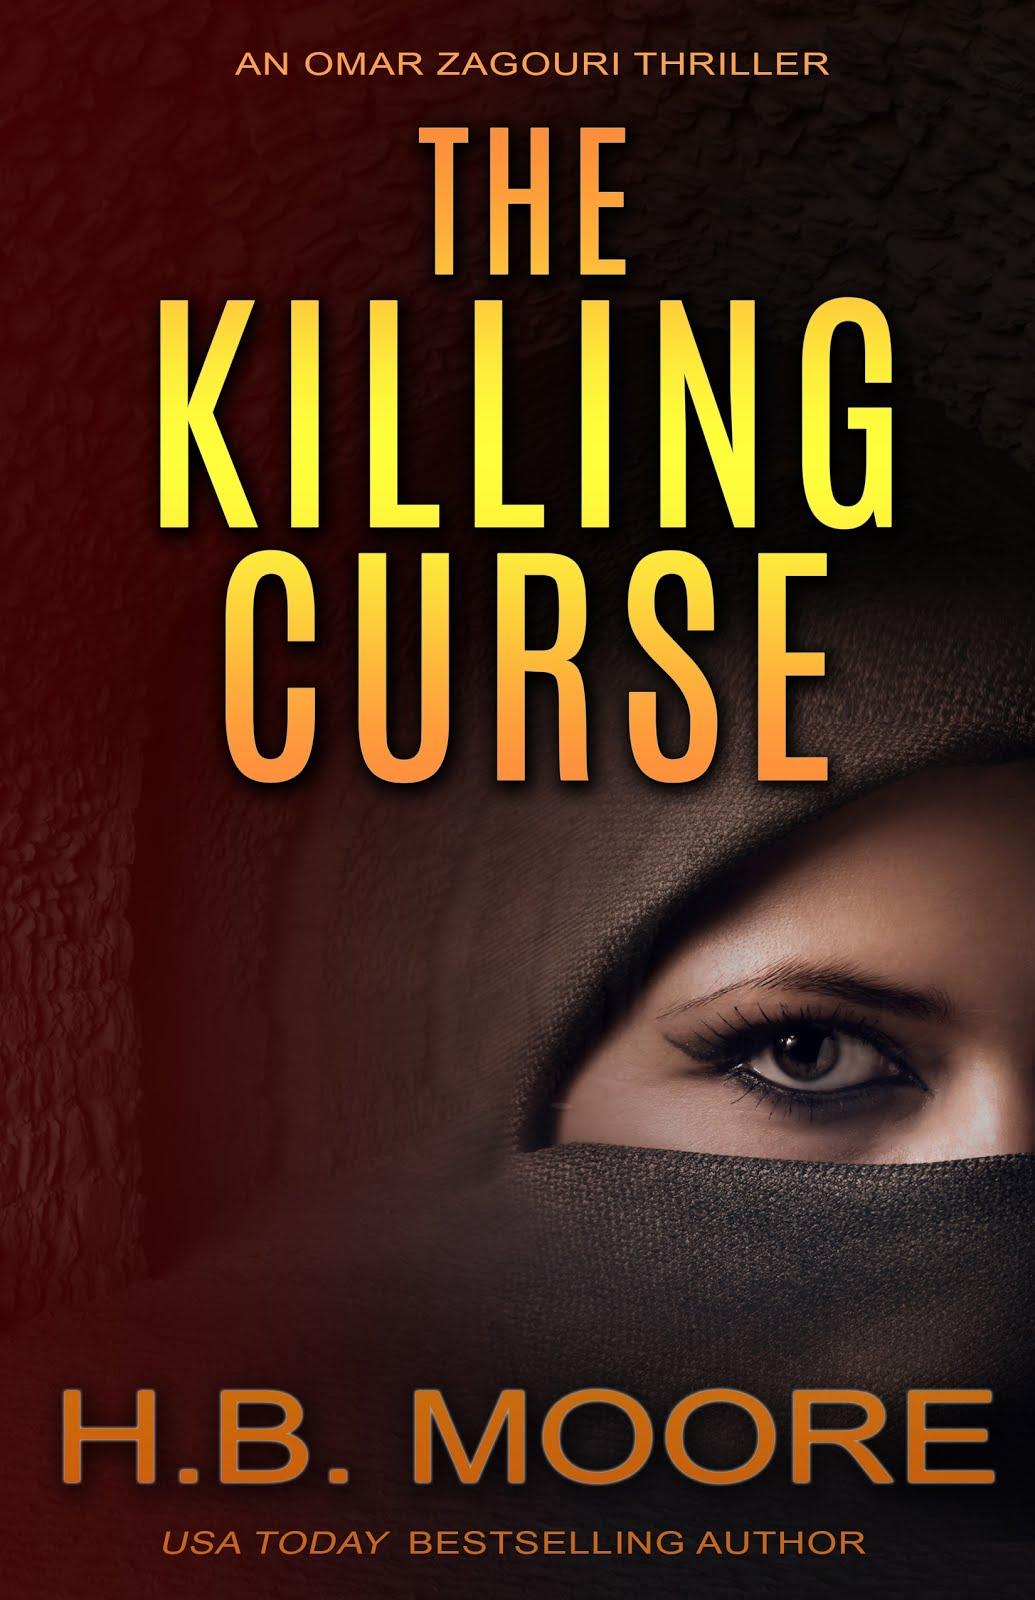 The Killing Curse